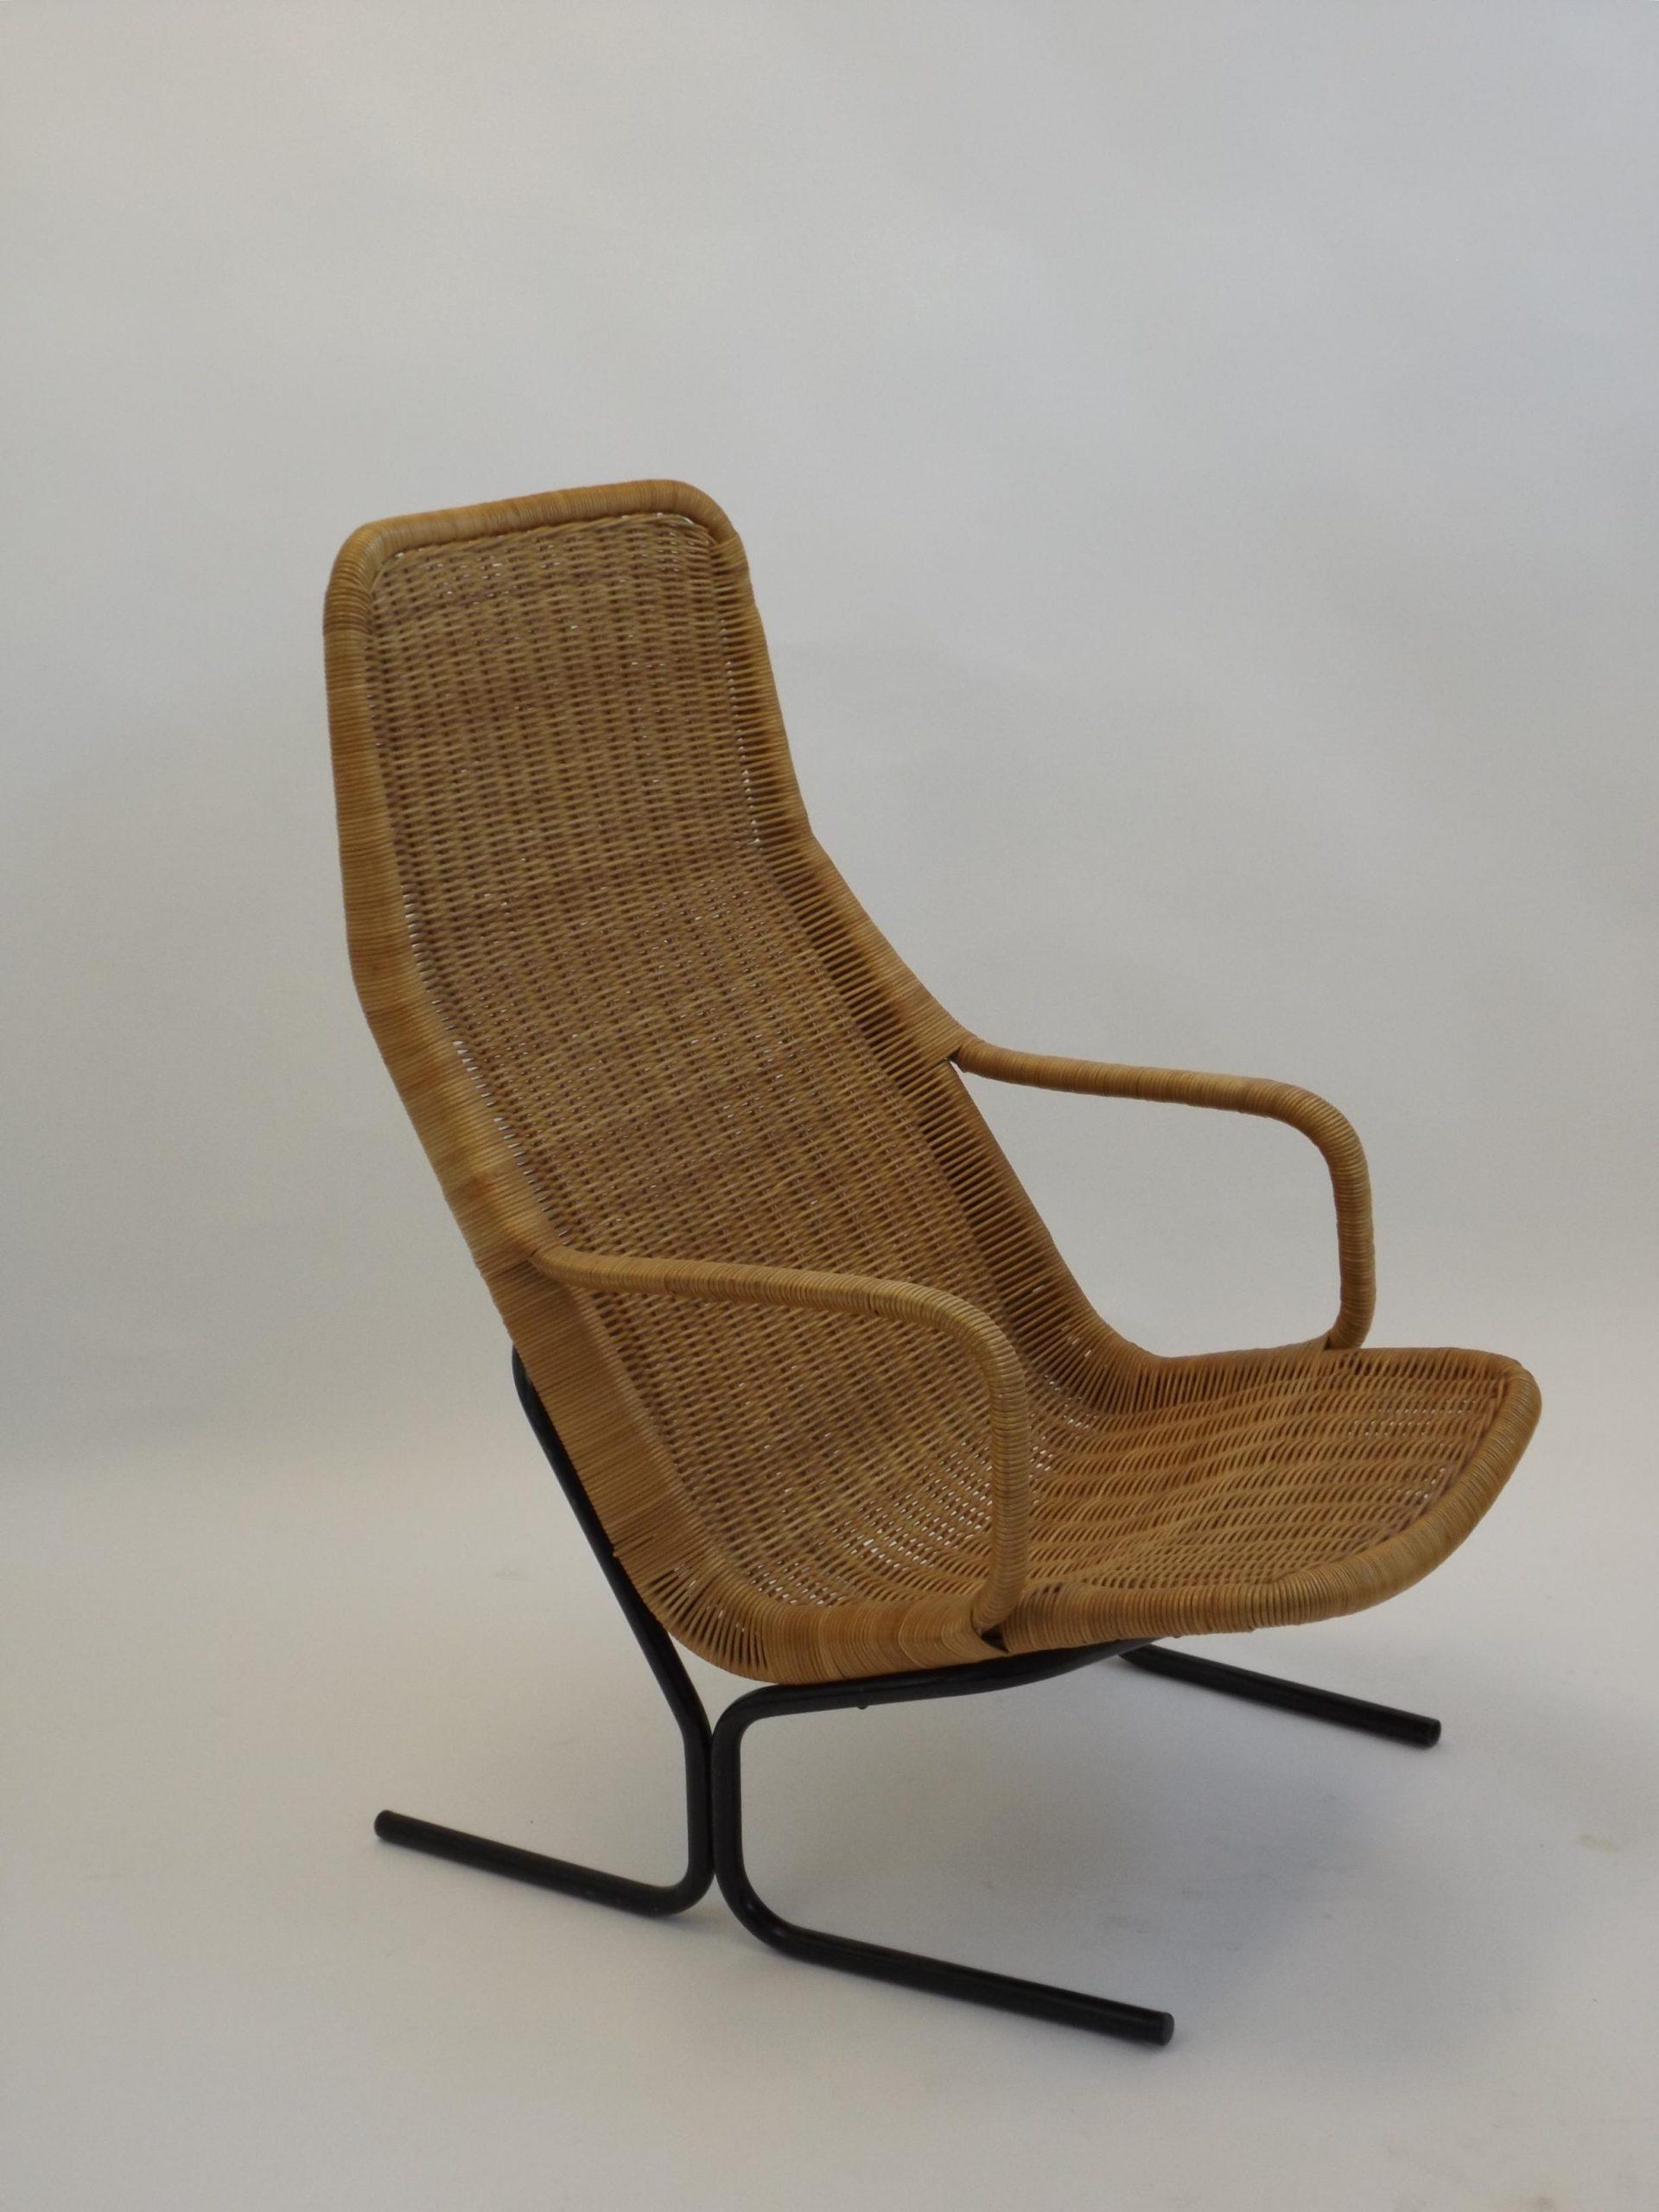 Rohé cane lounge chair